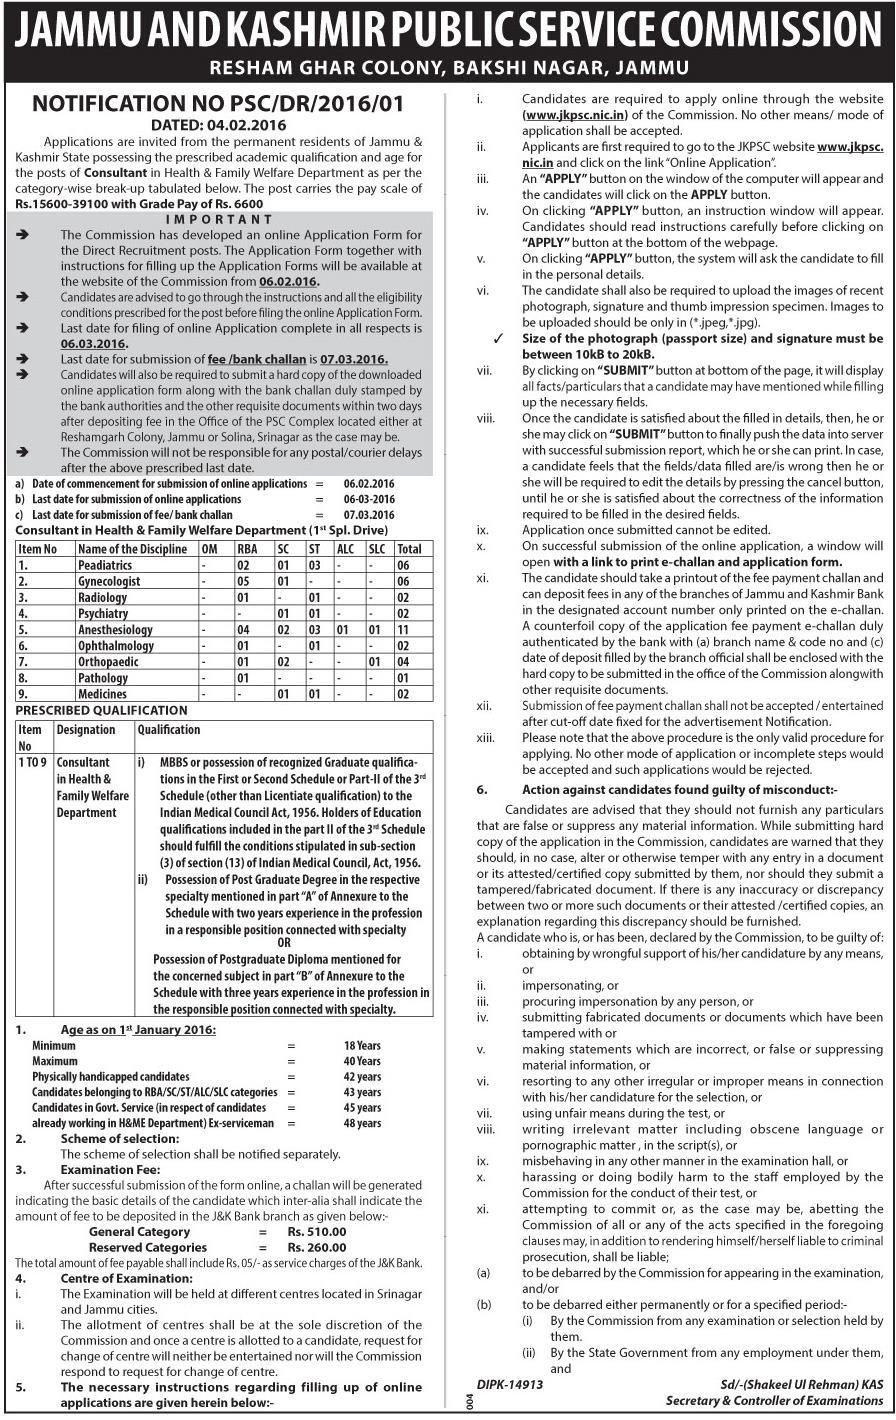 JKPSC Job Advertisement No. 01 of 2016